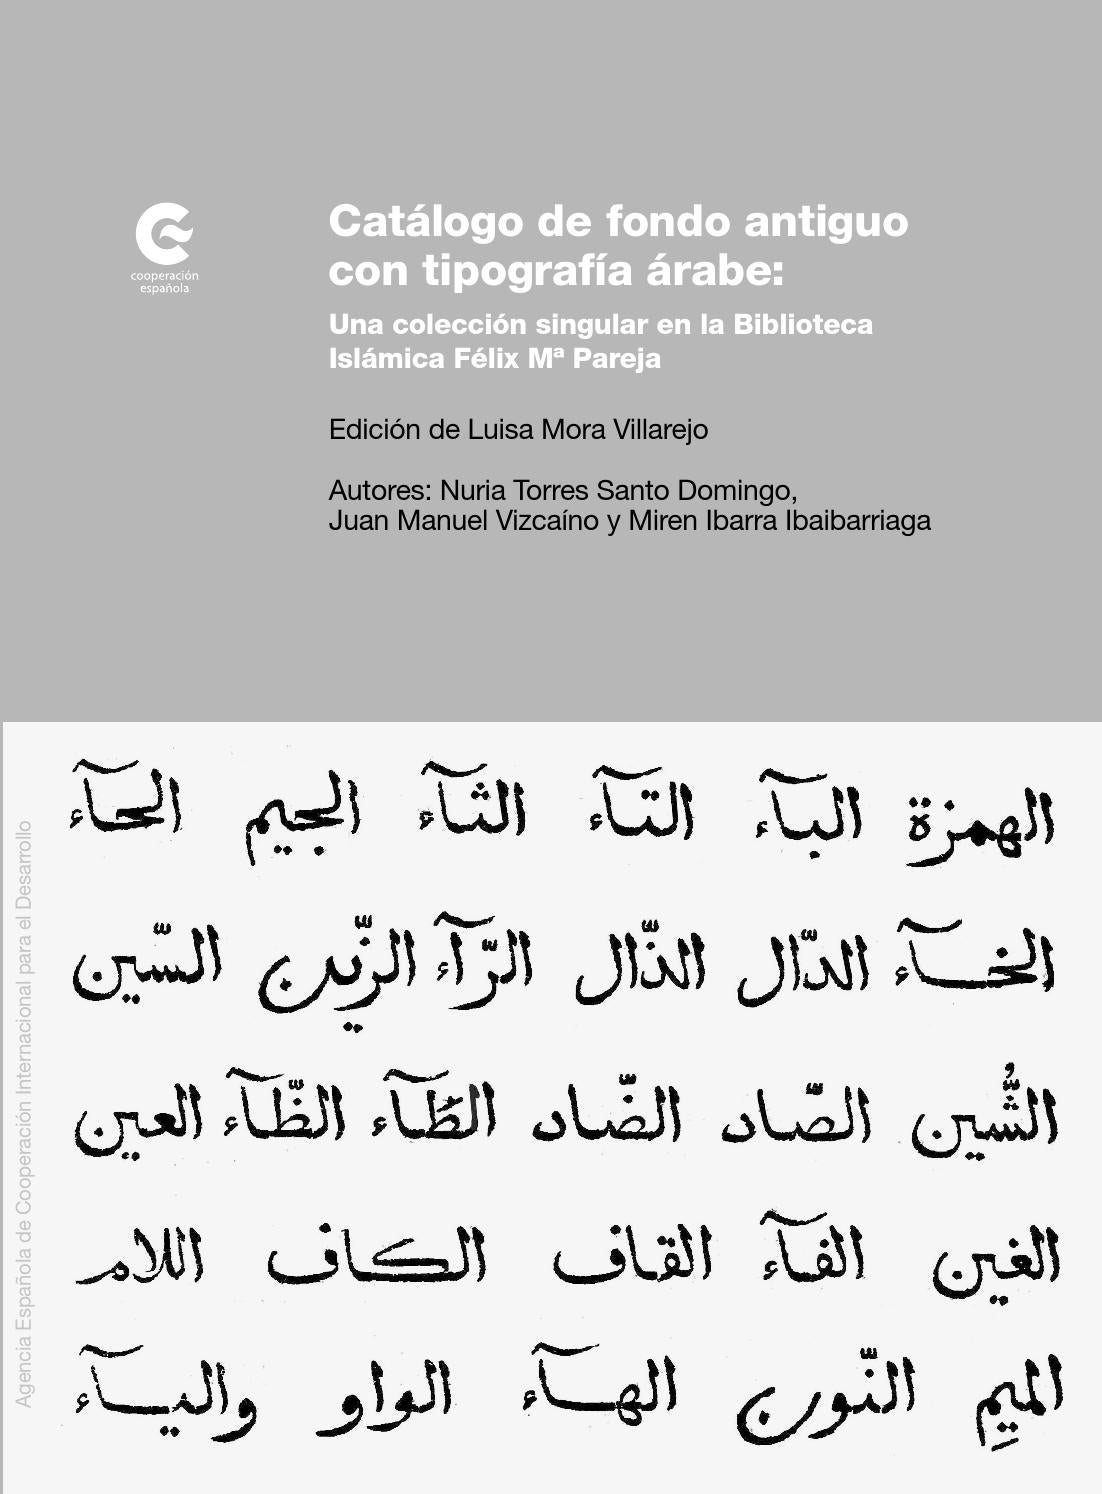 Catálogo de fondo antiguo con tipografía árabe. Bilioteca Islámica ...